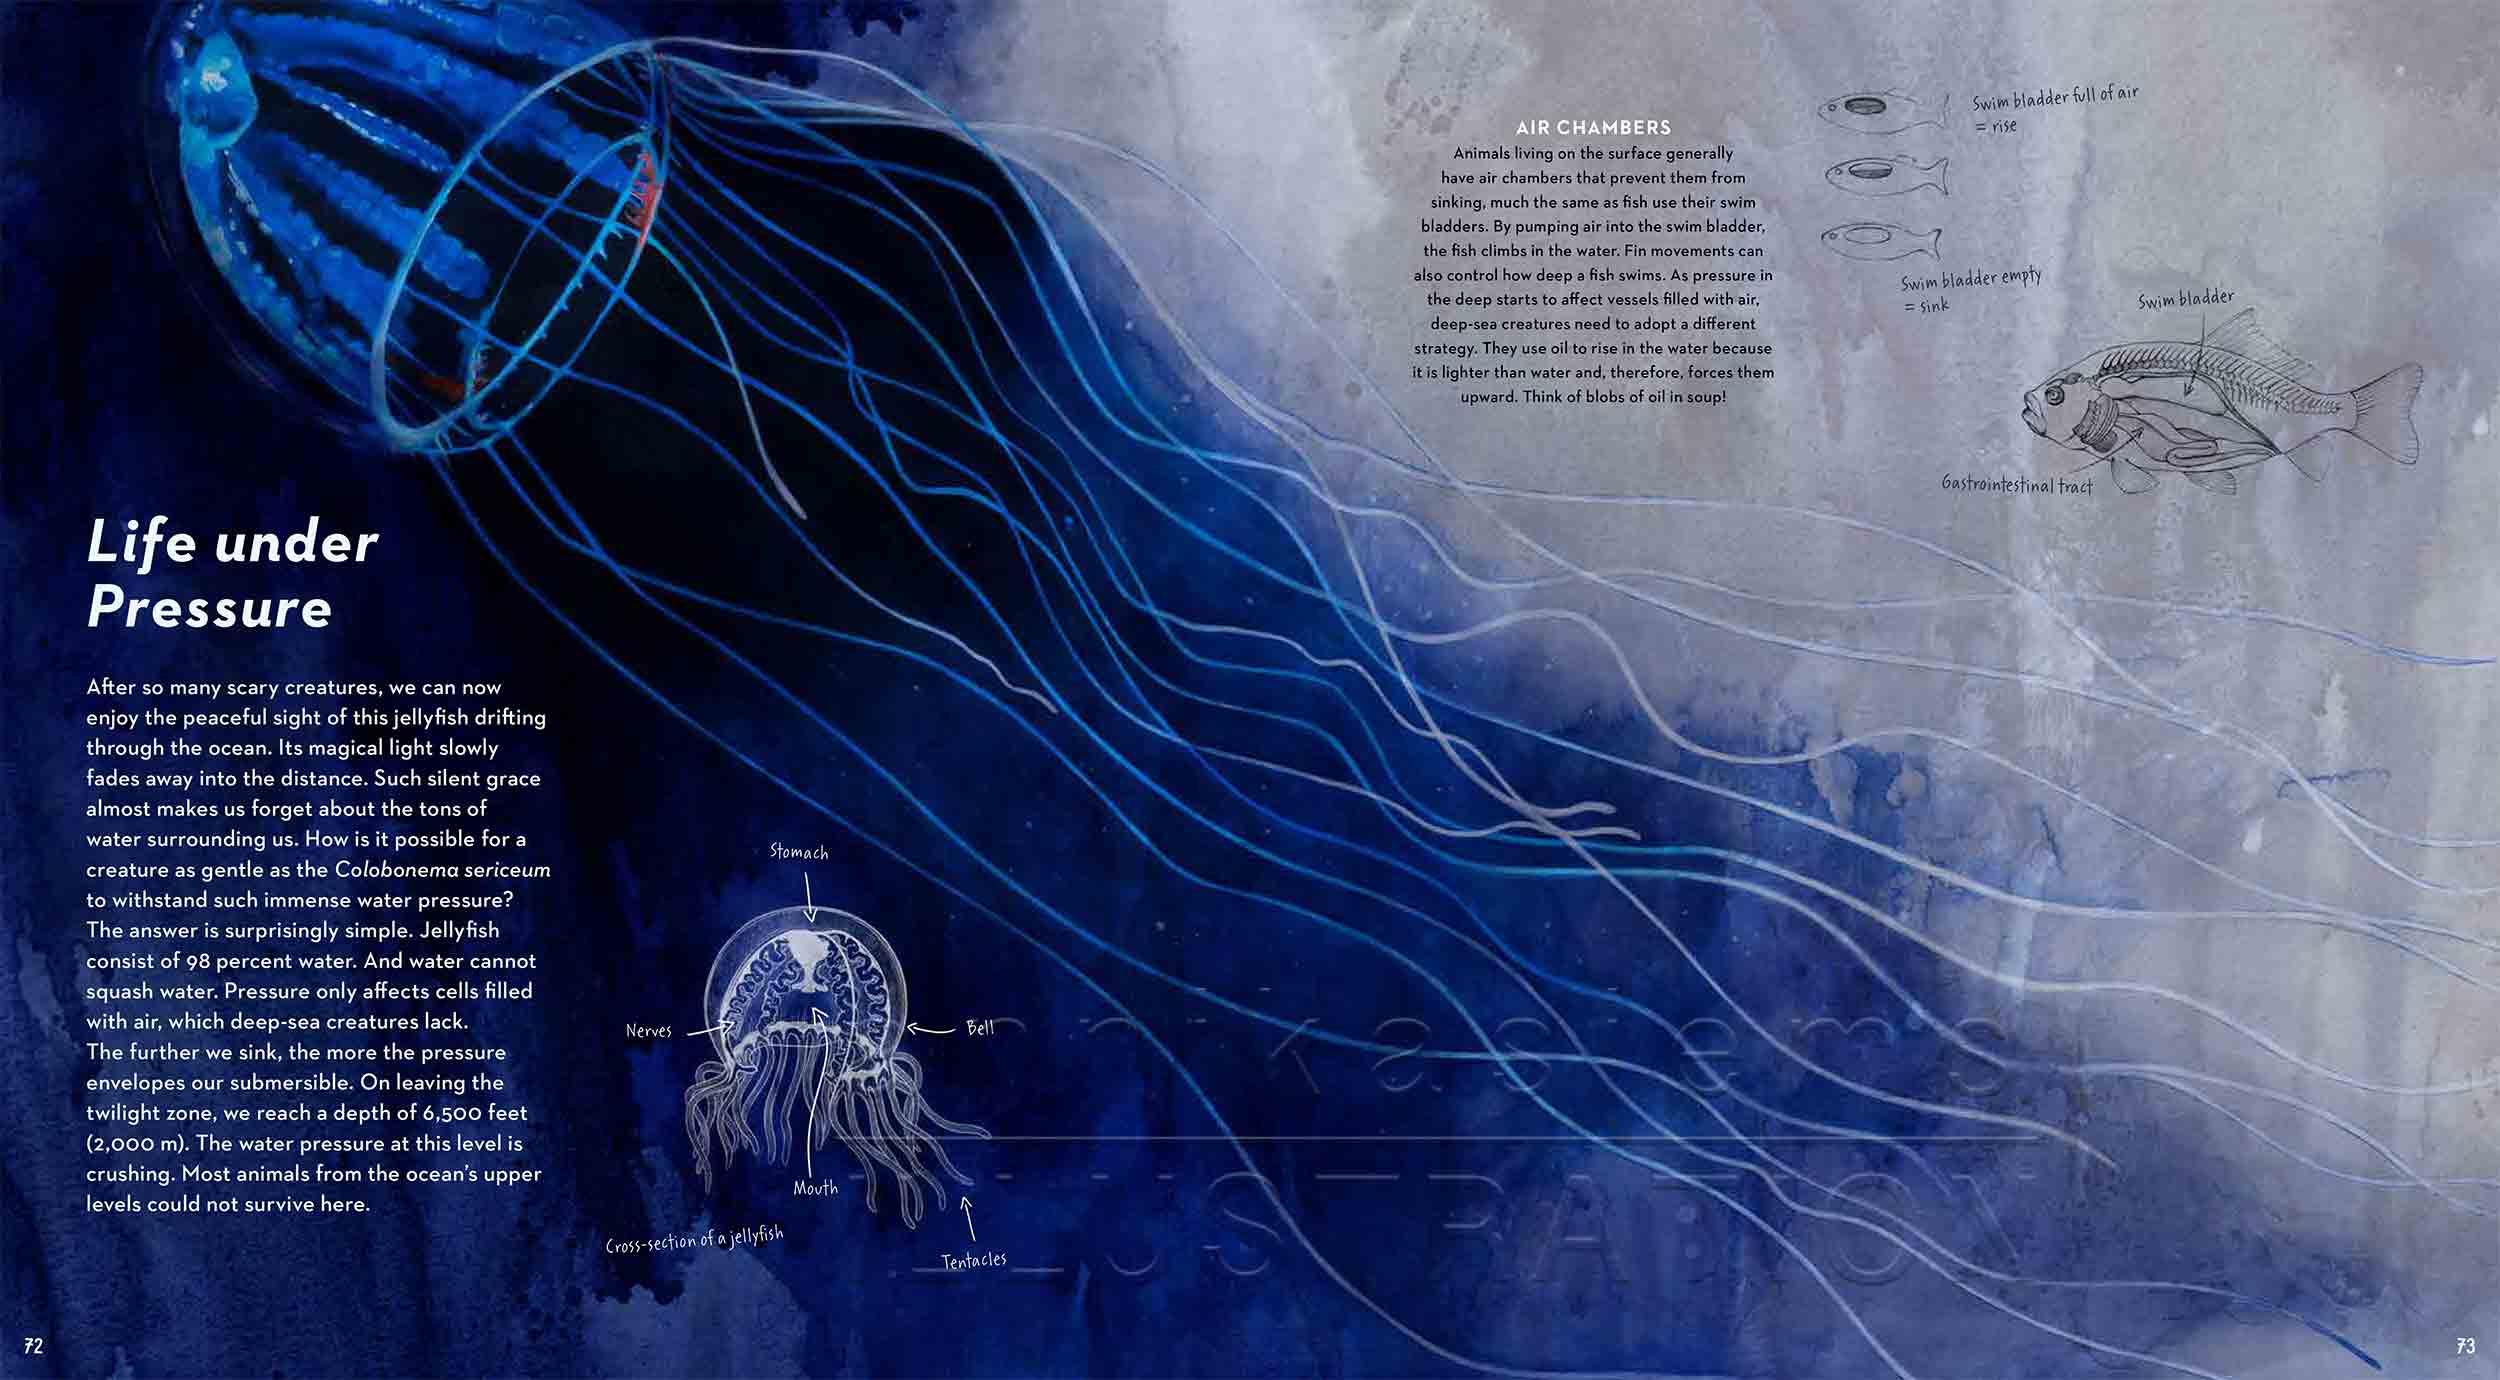 72-73-pressure-jellyfish-anatomy-deep-sea-Englisch-submersible-©annikasiems-plankton_deepsea-zooplankton.jpg